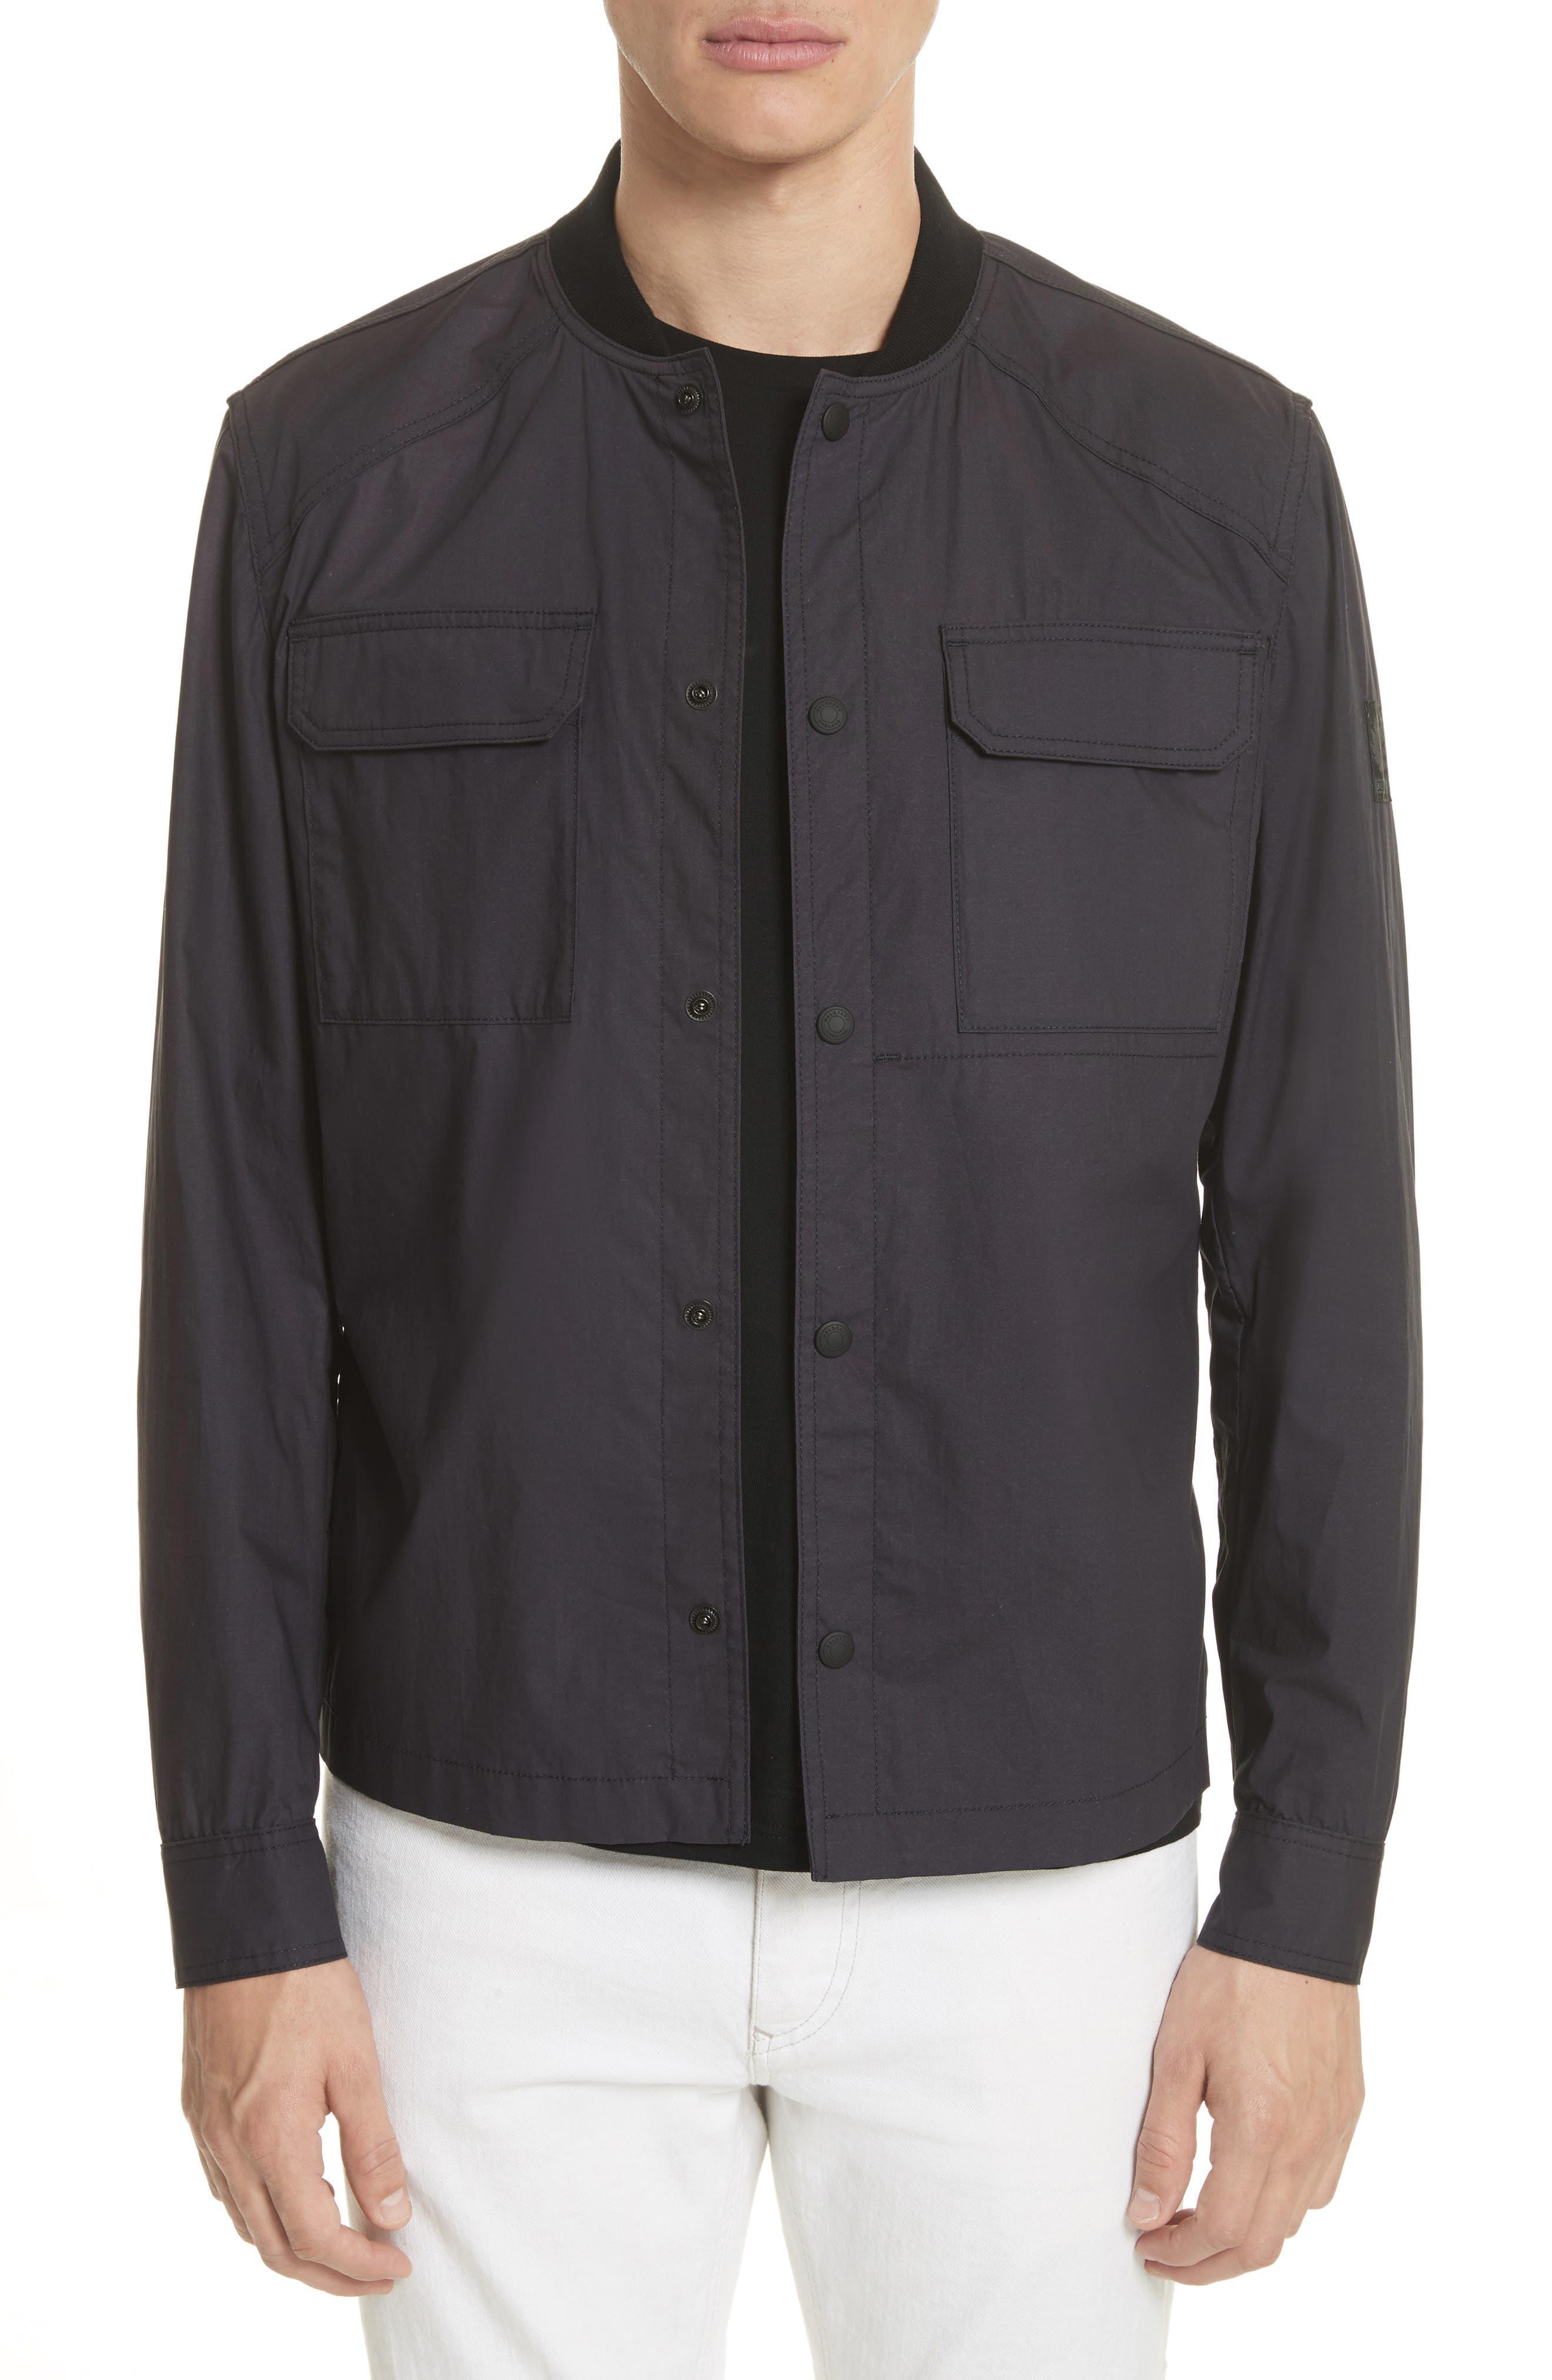 Cardingham Jacket,                             Main thumbnail 1, color,                             020